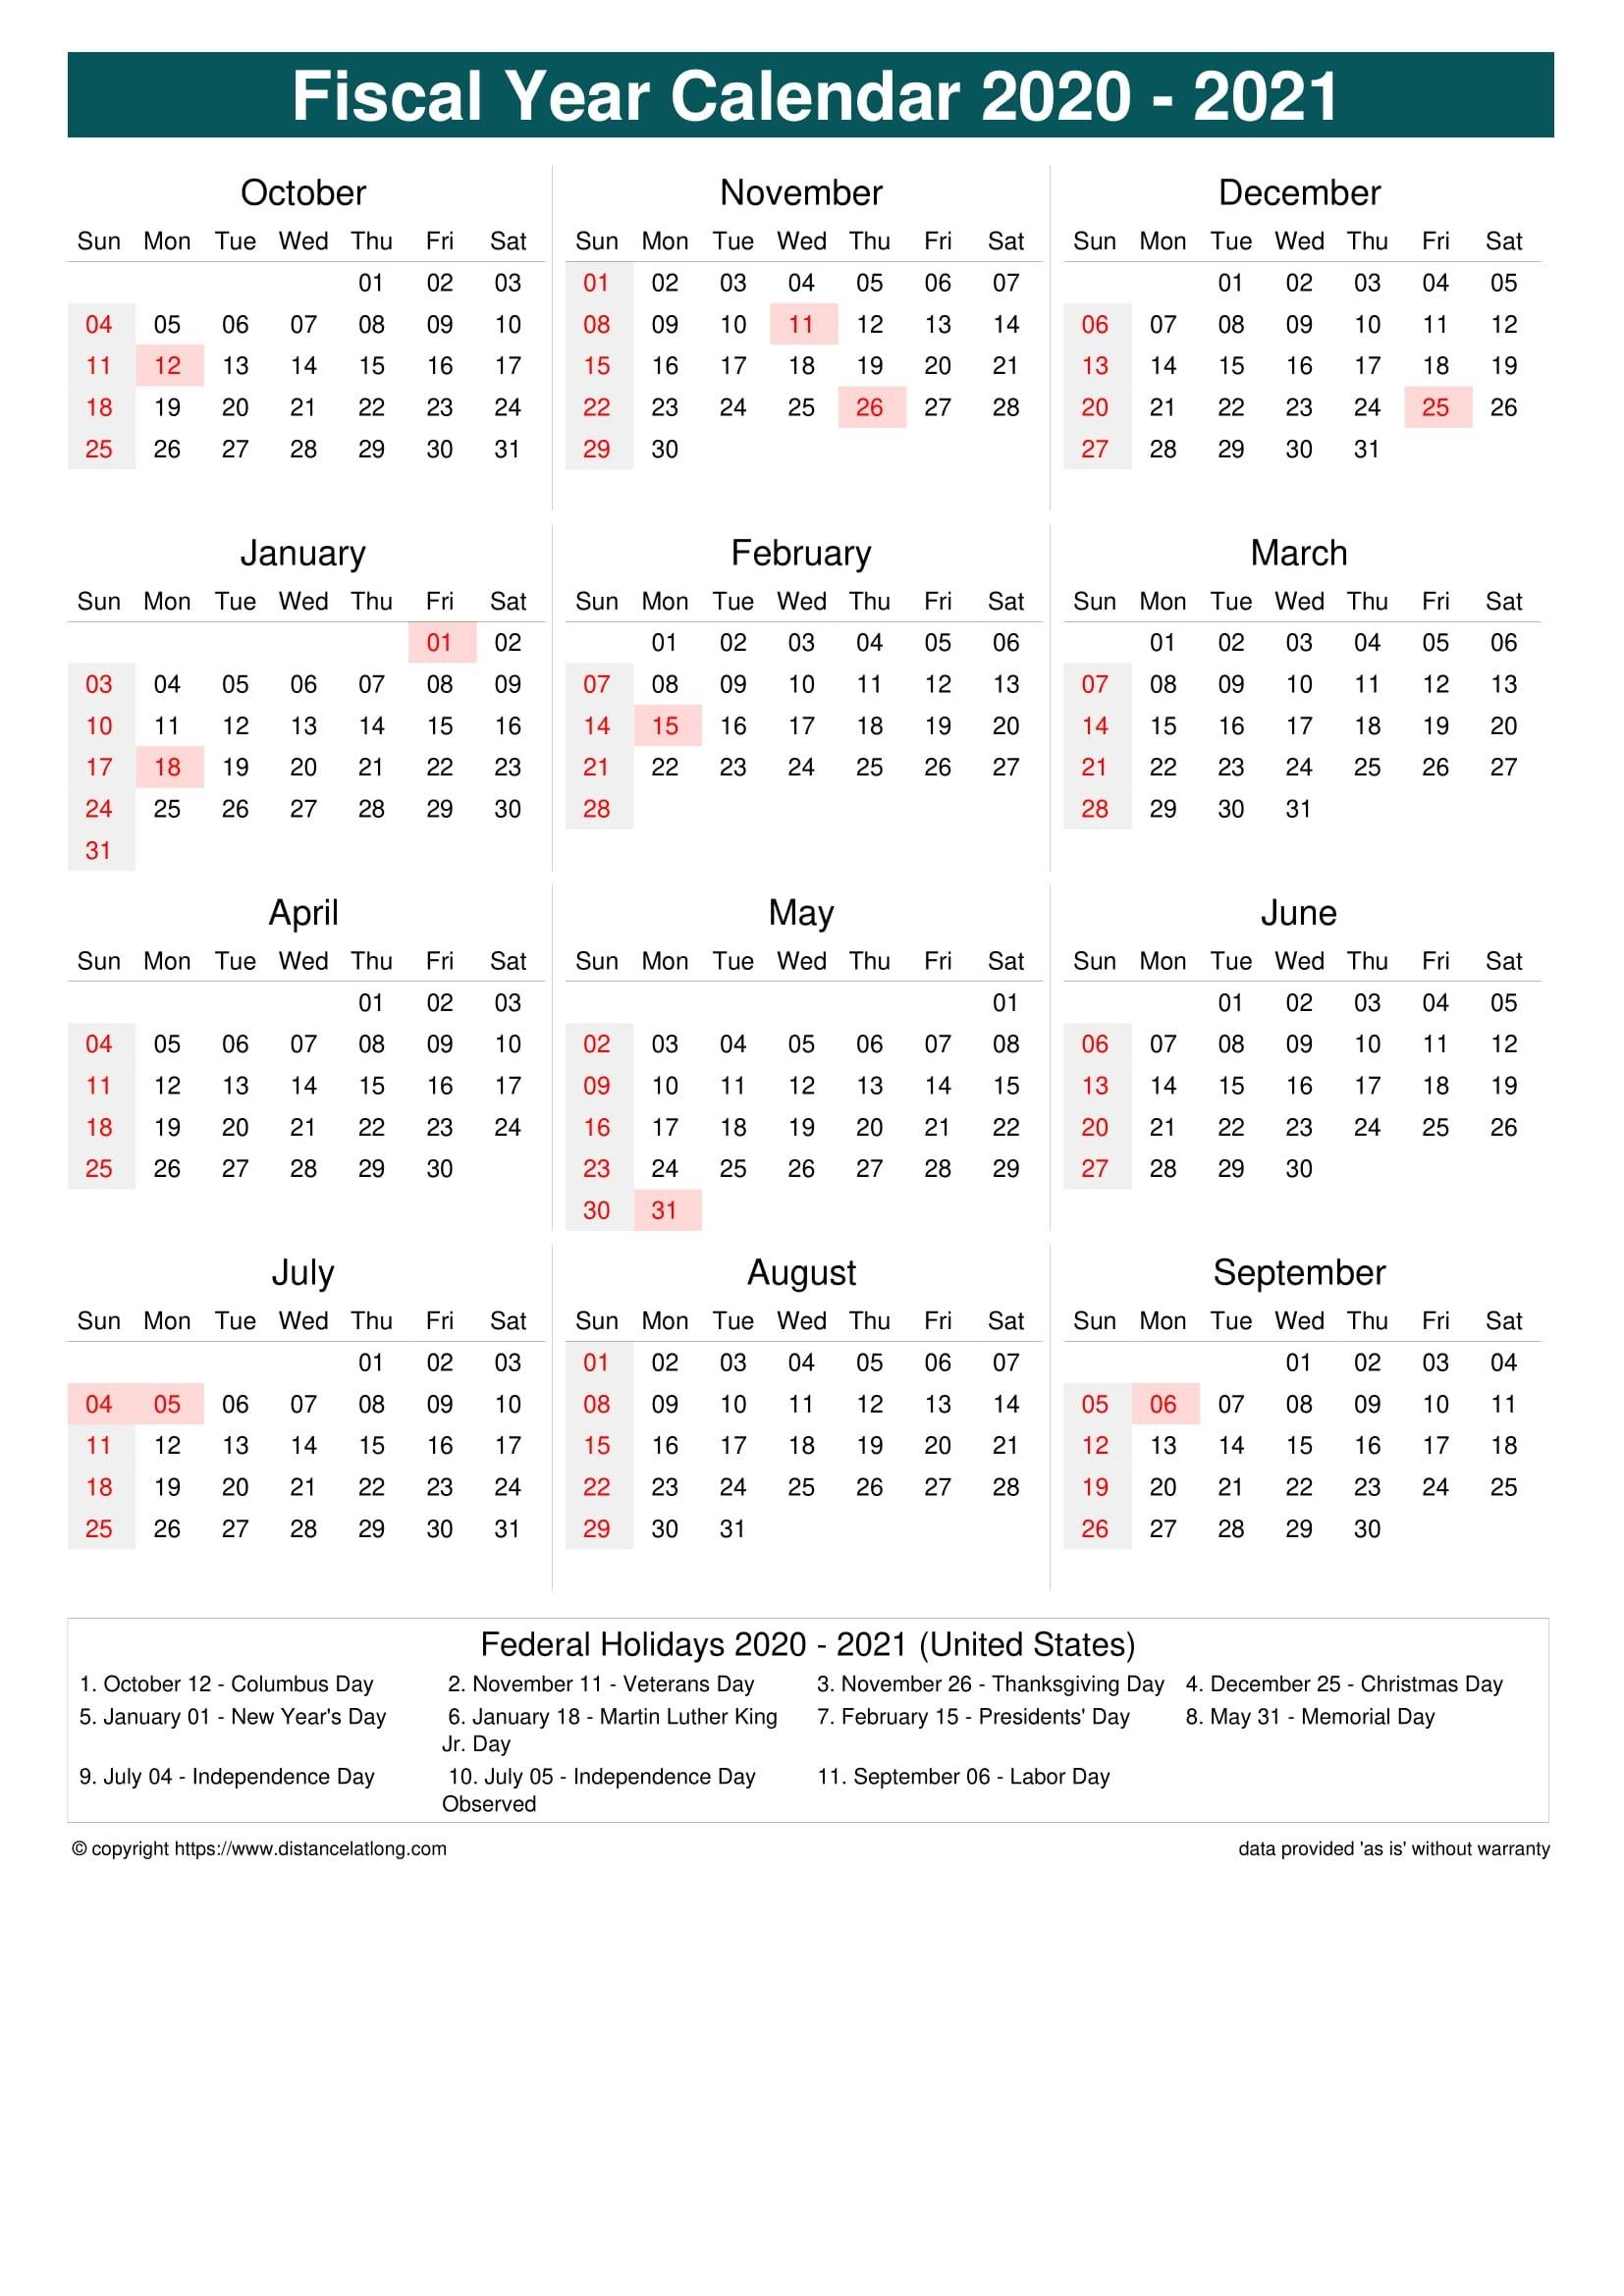 2021 Us Holidays Printable List   Calendar Template Printable within Federal Holidays 2025